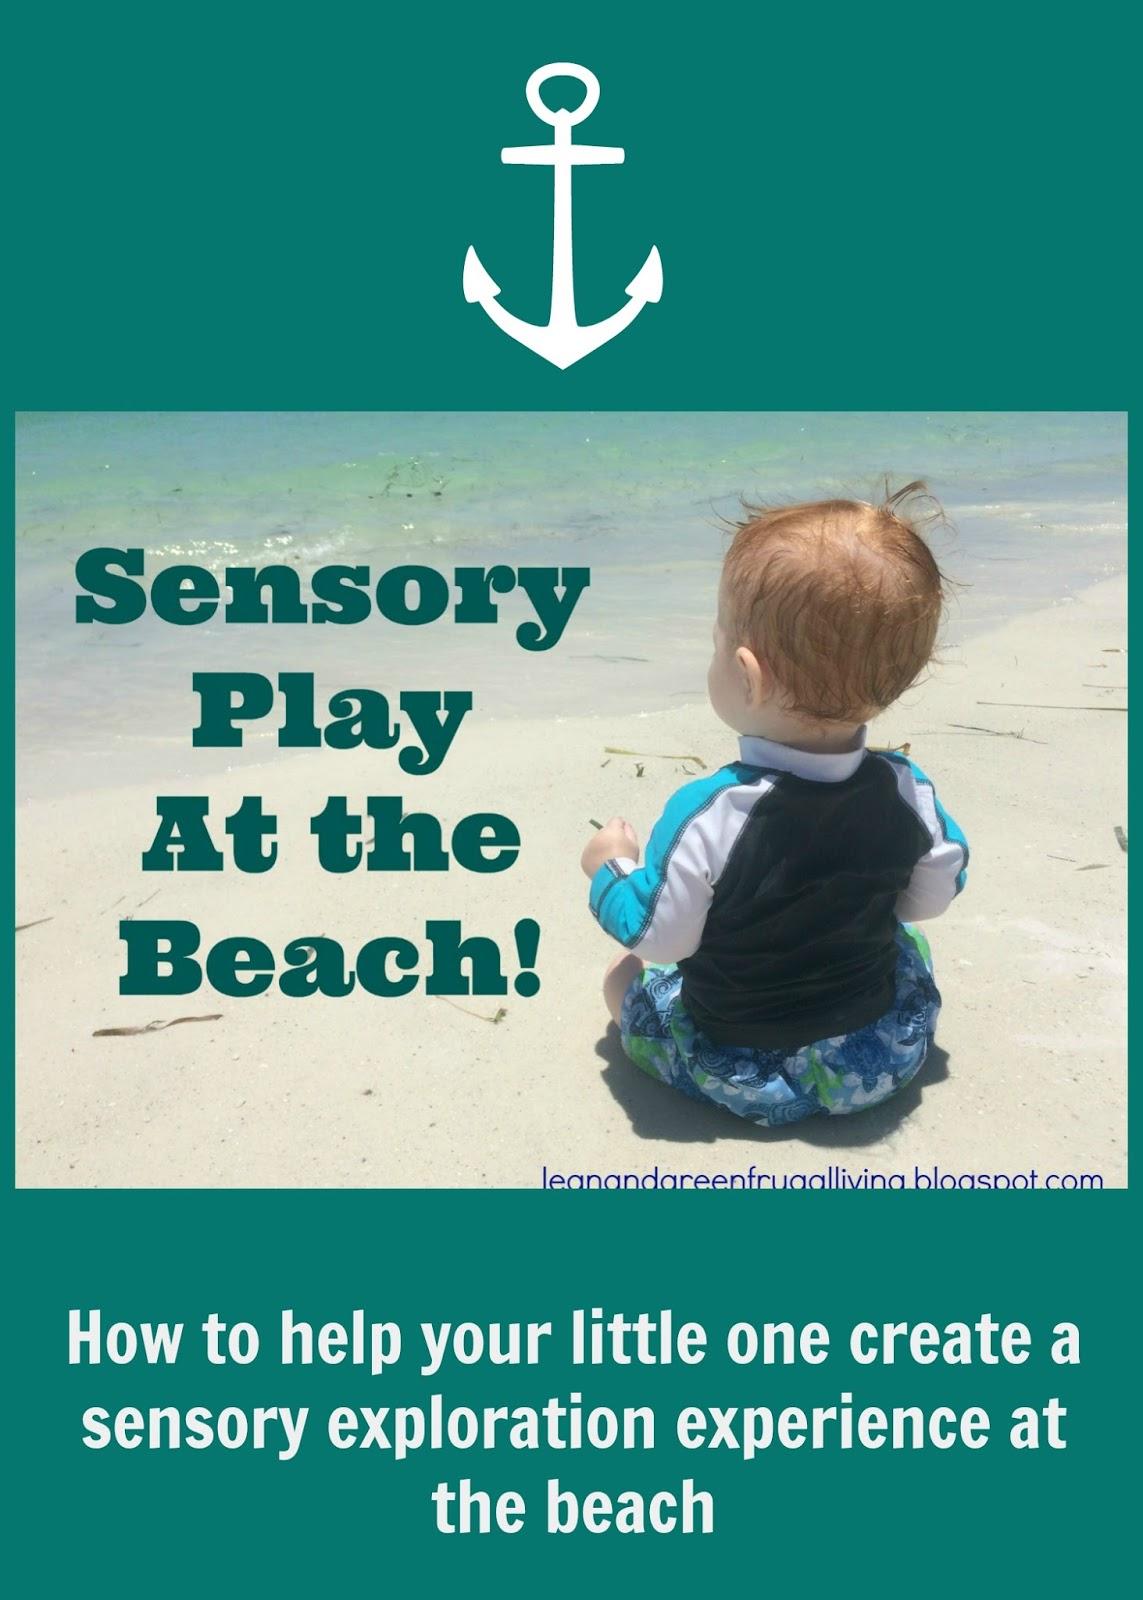 Sensory Play at the Beach